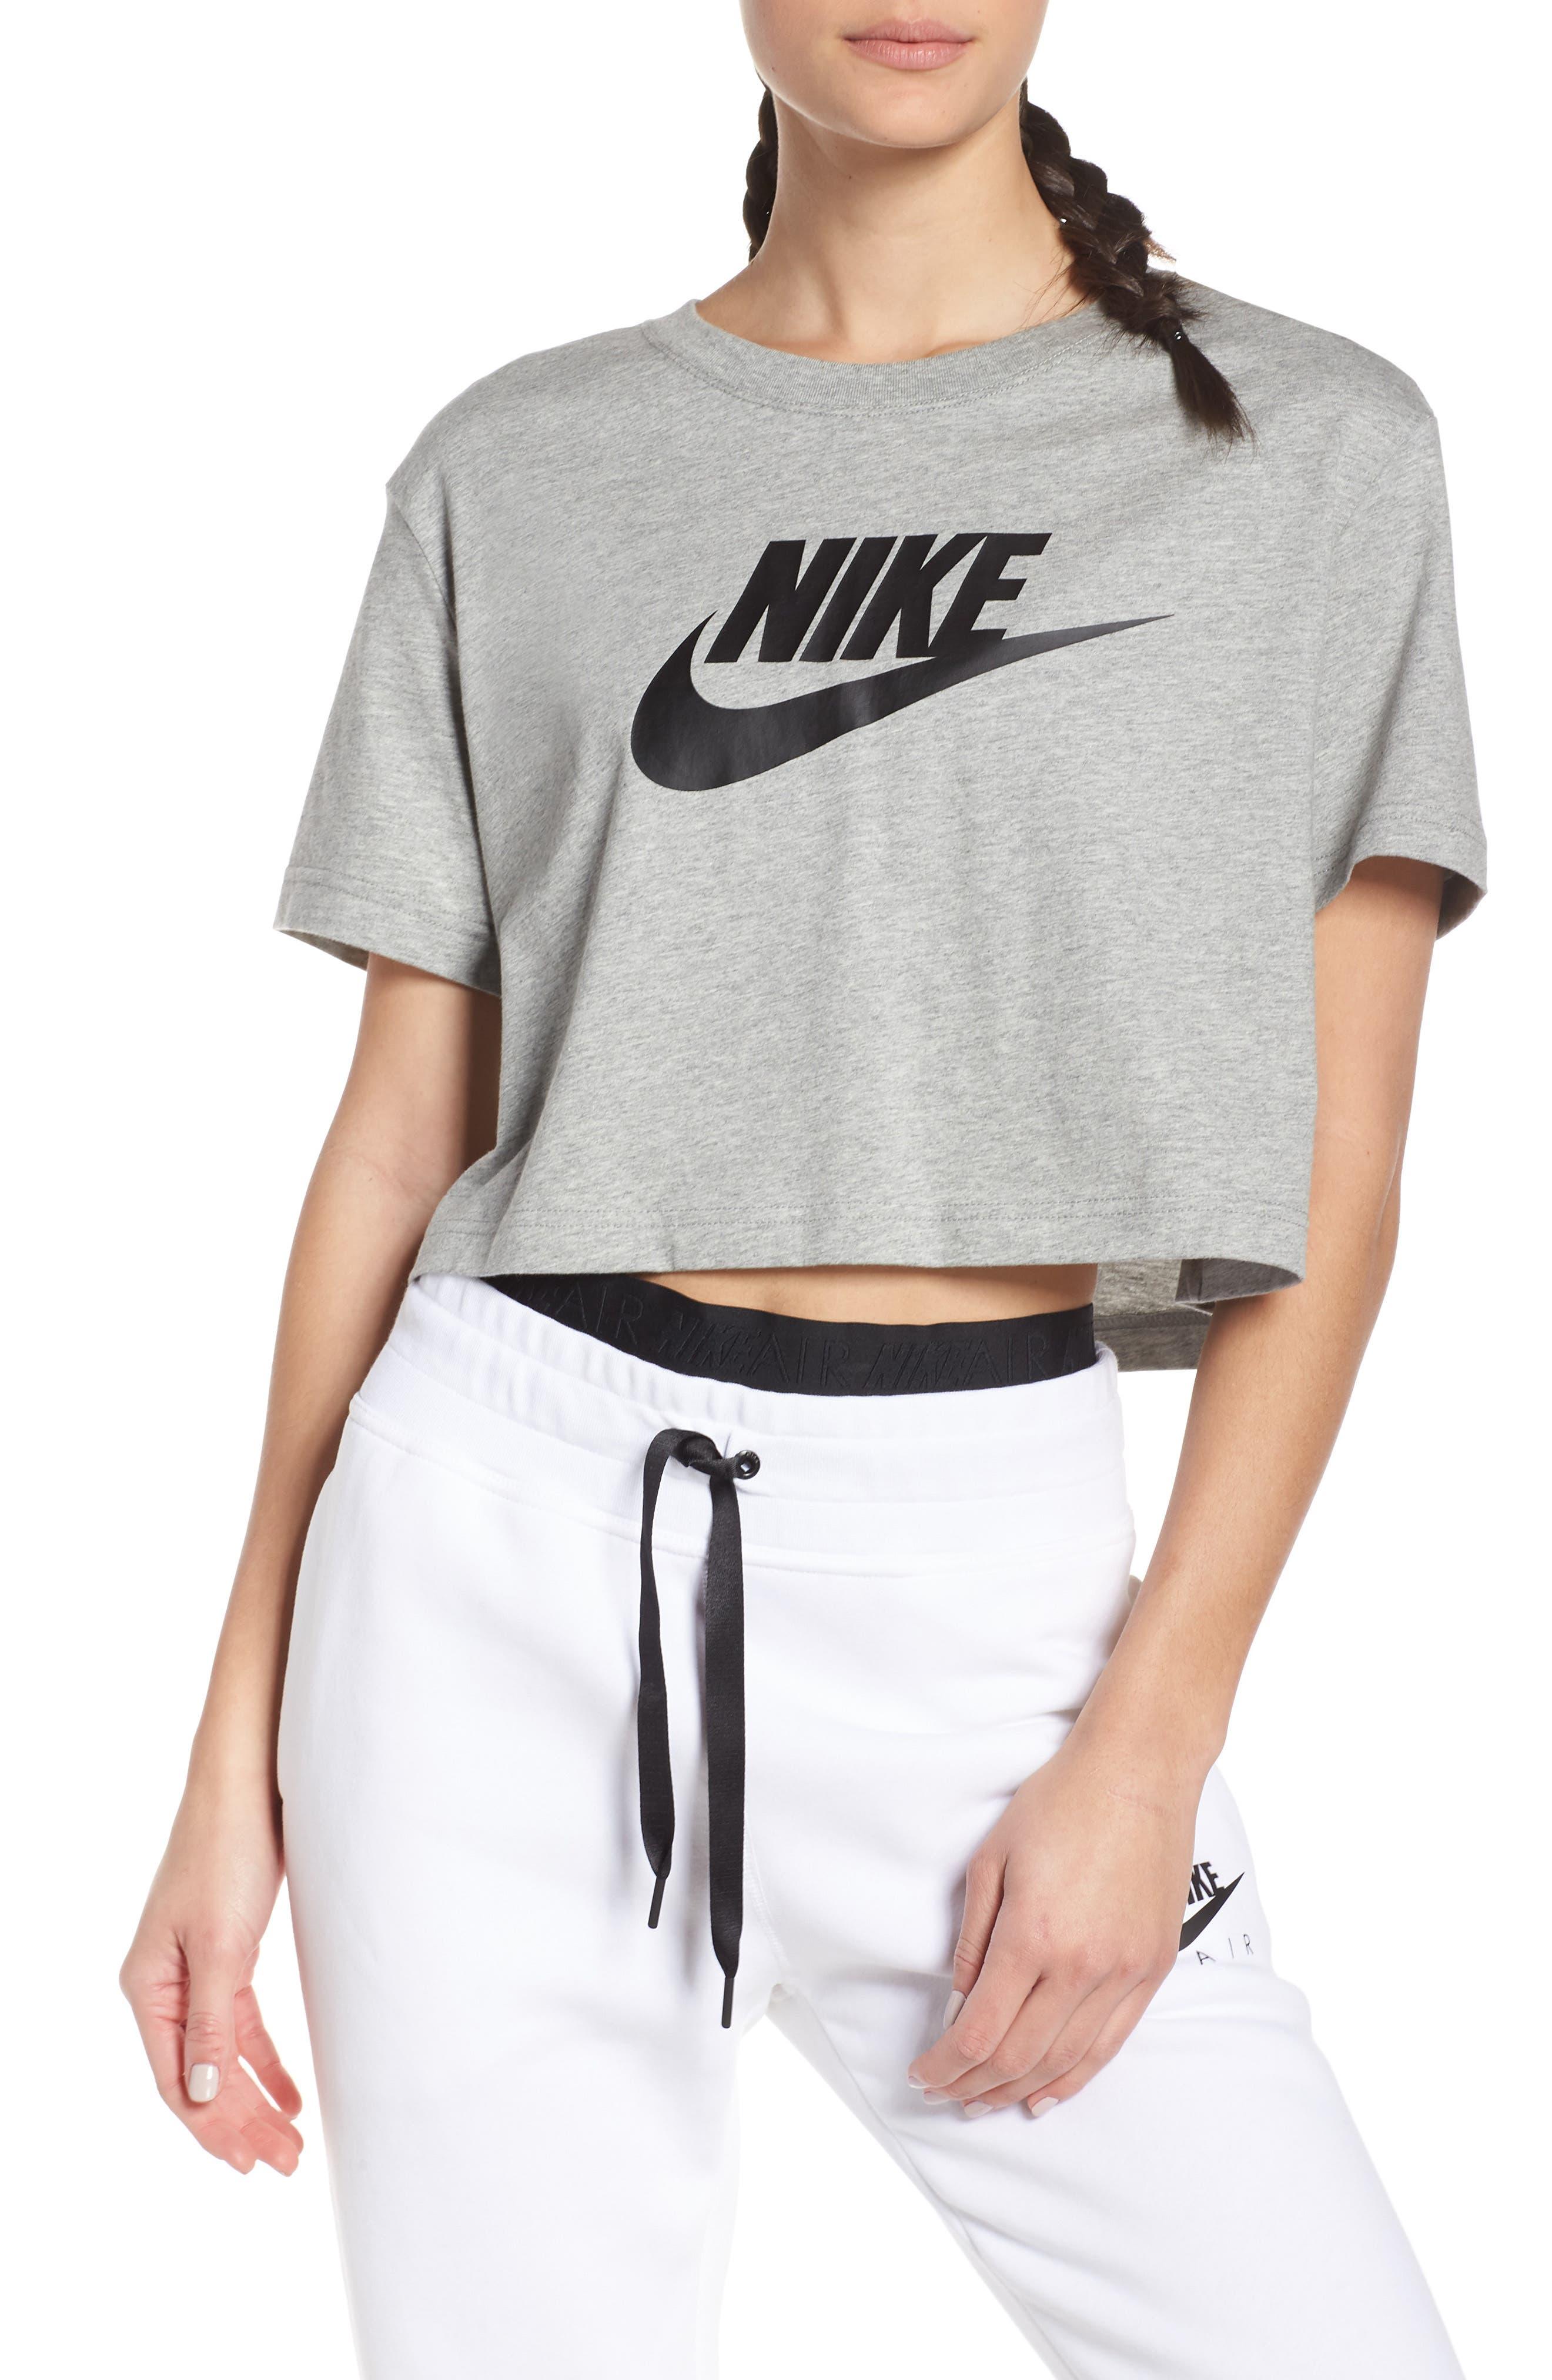 Women's Nike Tops | Nordstrom